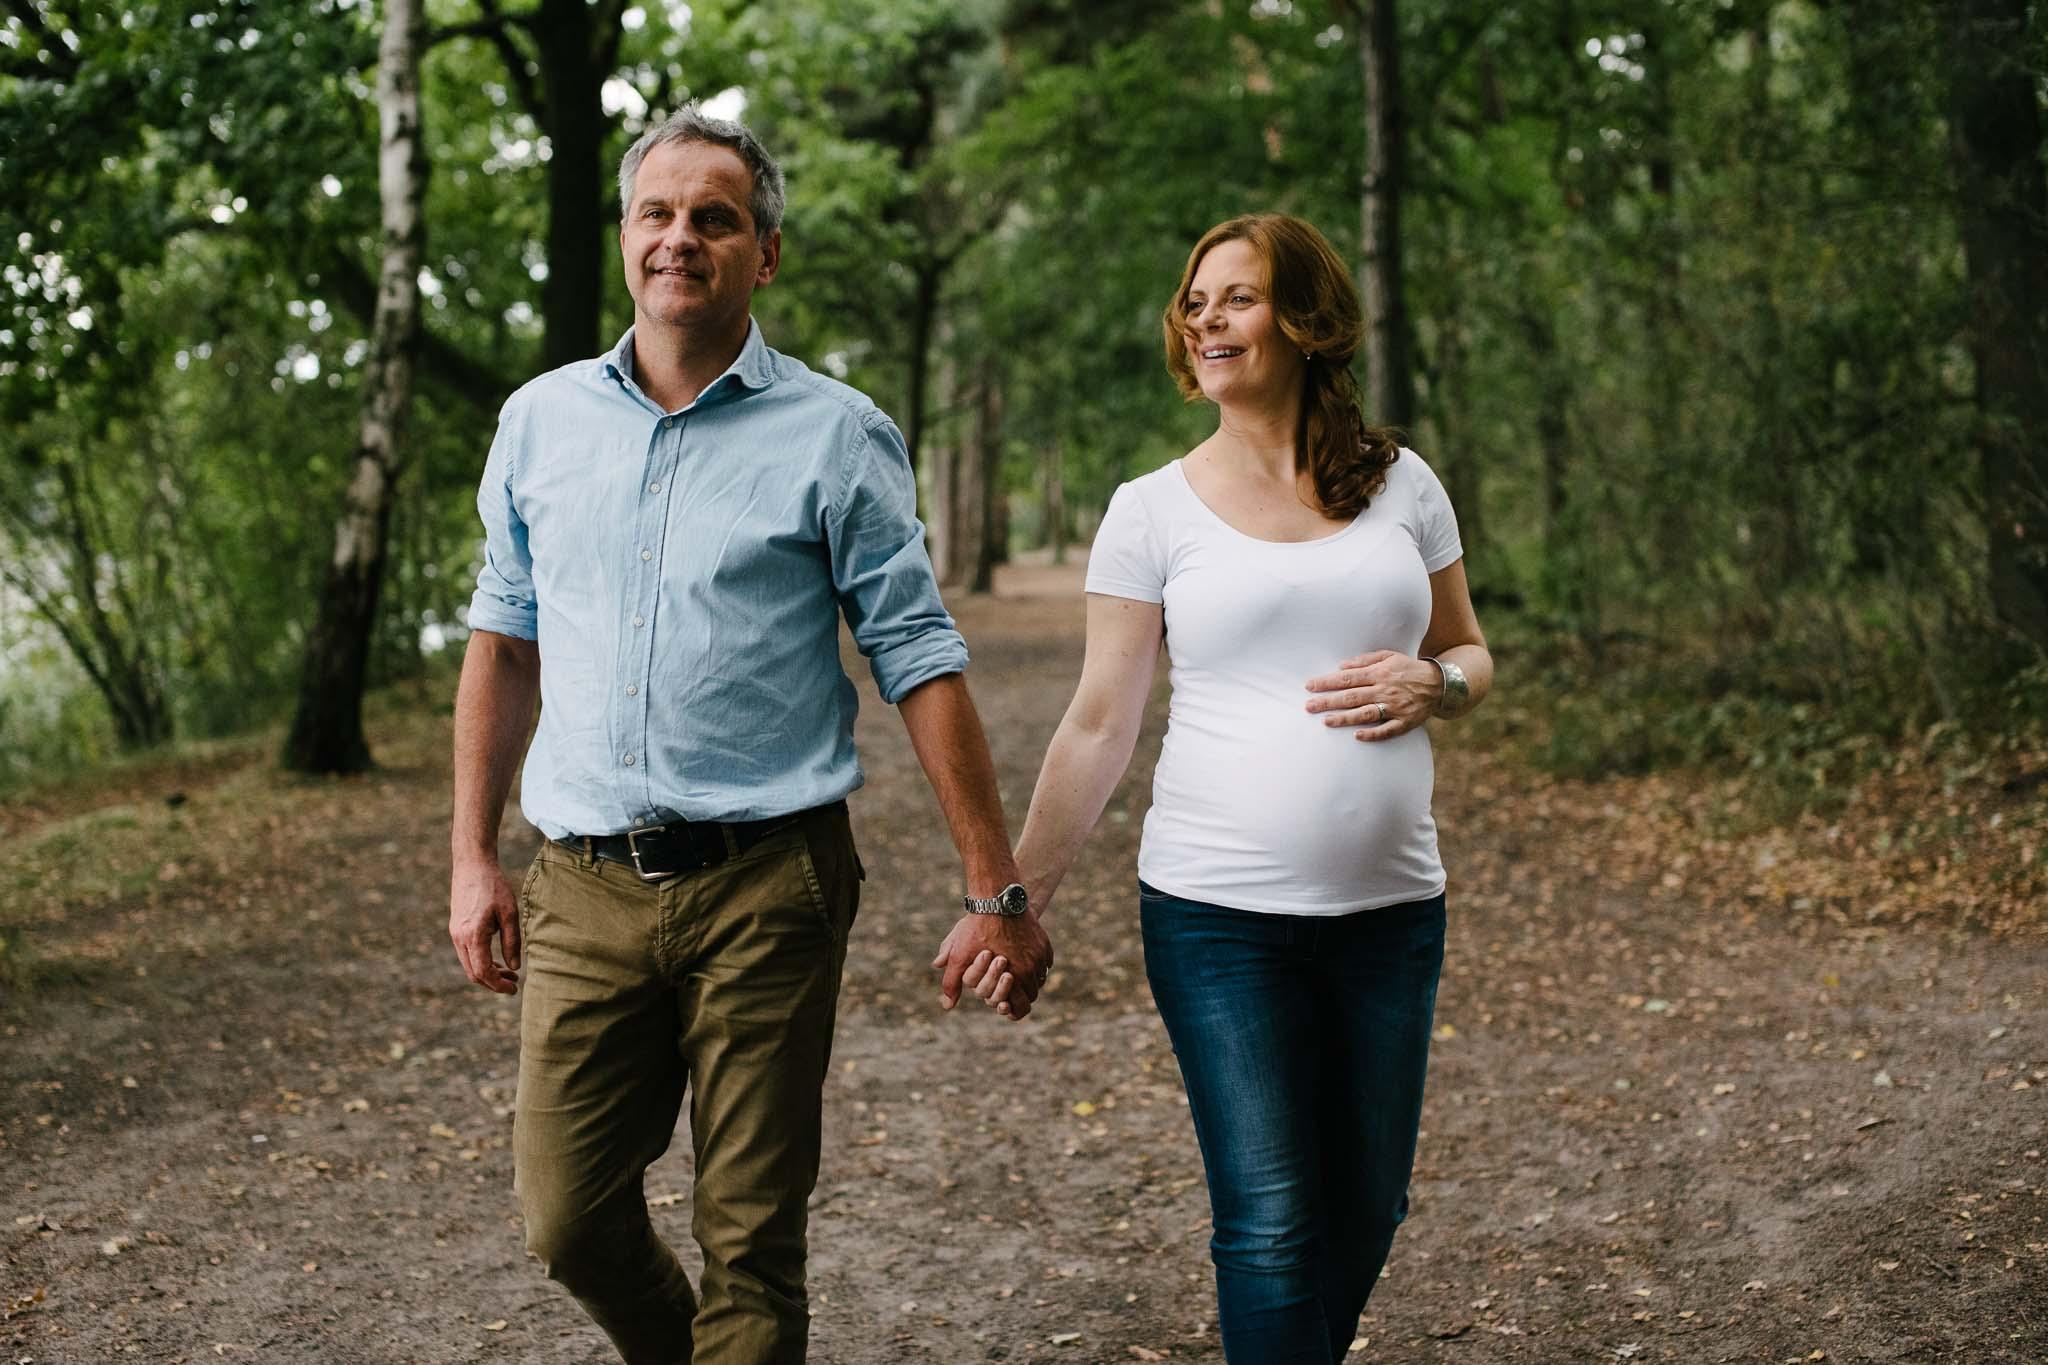 stoere originele zwangerschapsfoto's